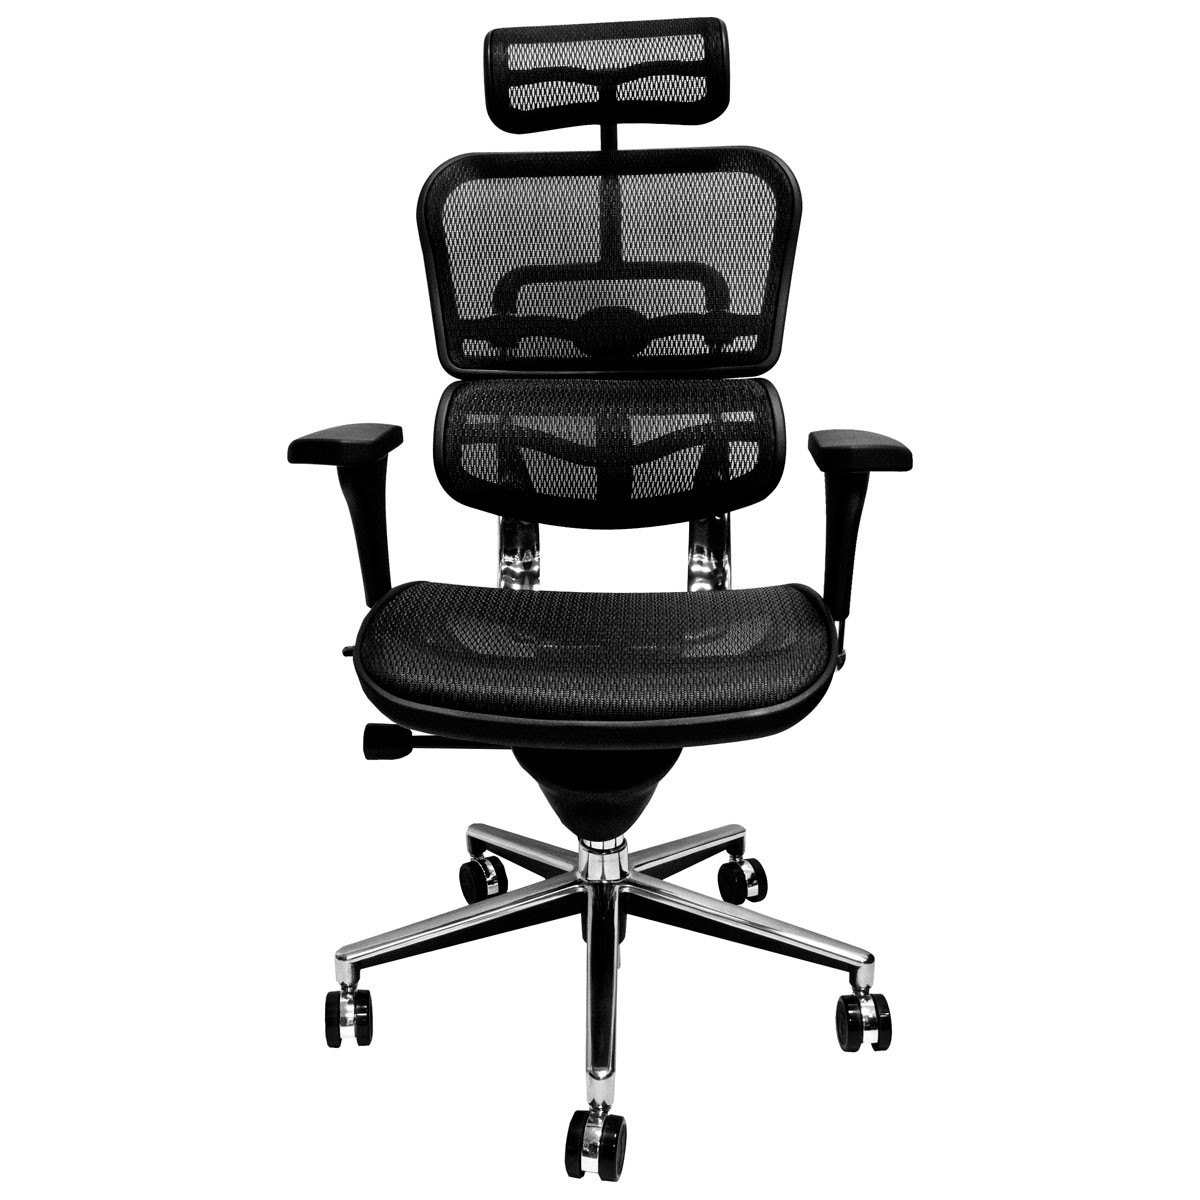 Fantastic Raynor Ergohuman Mesh Chair Me7Erg Ergonomic Chair Pro Ibusinesslaw Wood Chair Design Ideas Ibusinesslaworg